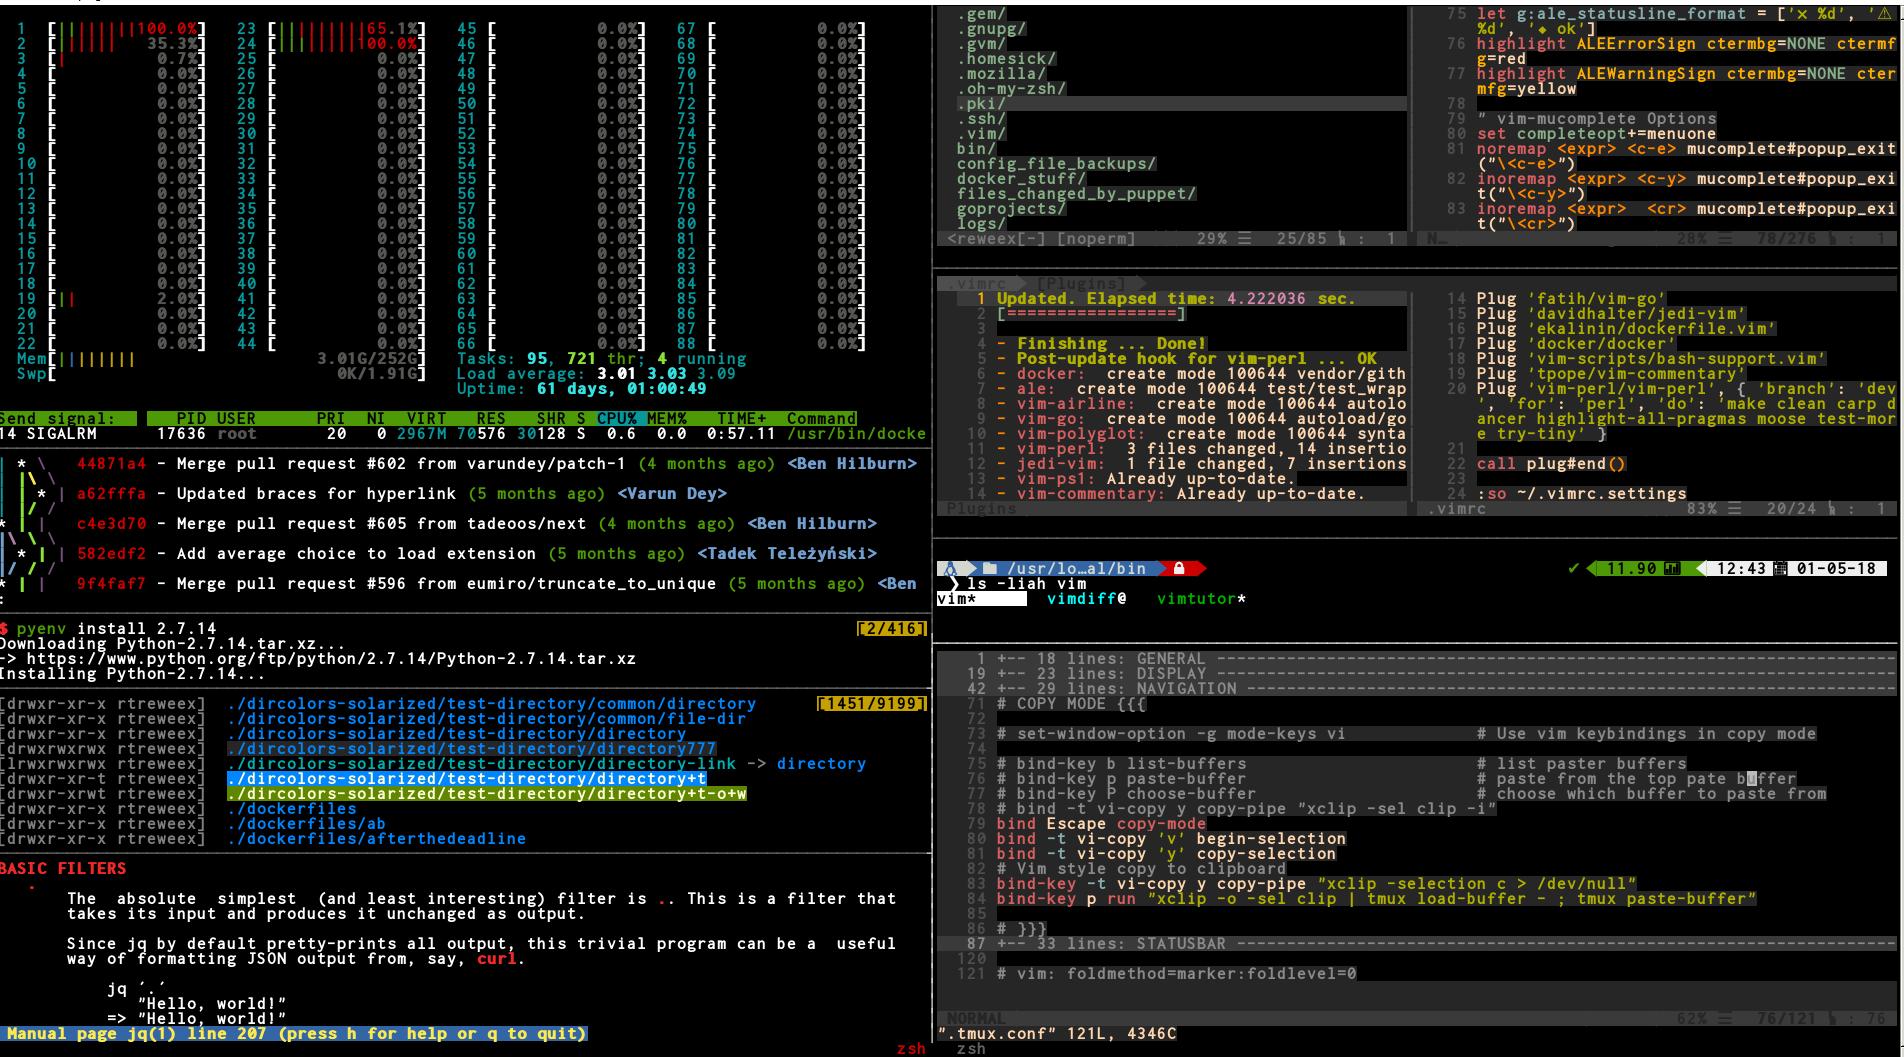 GitHub - rodtreweek/Castle-Winbuntu: Homesick Castle for use